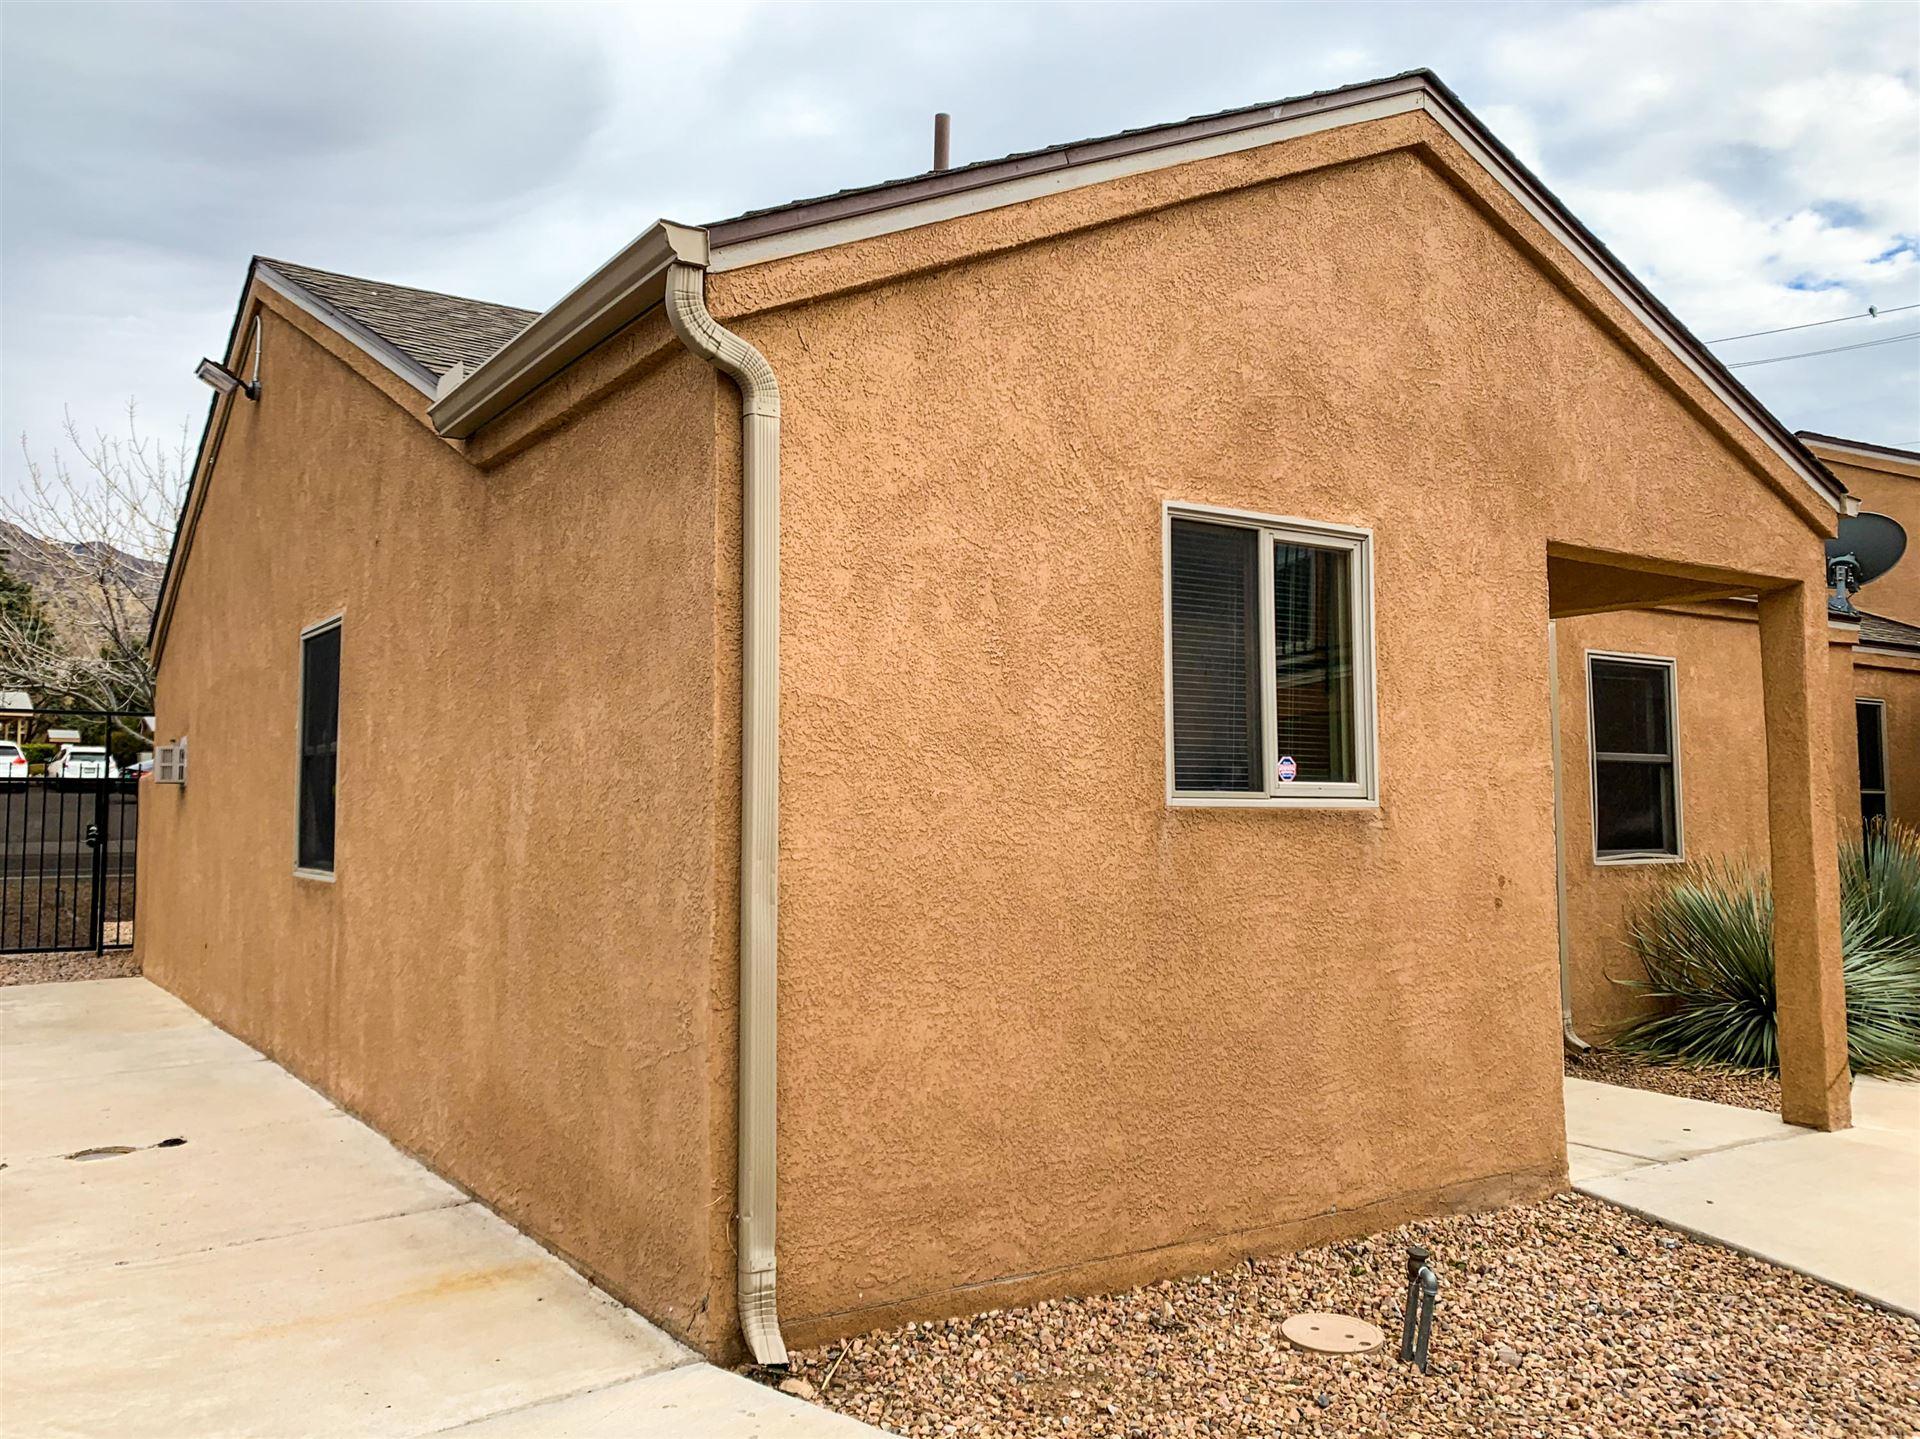 Photo of 2401 CHELWOOD PARK Boulevard NE #A, Albuquerque, NM 87112 (MLS # 984183)